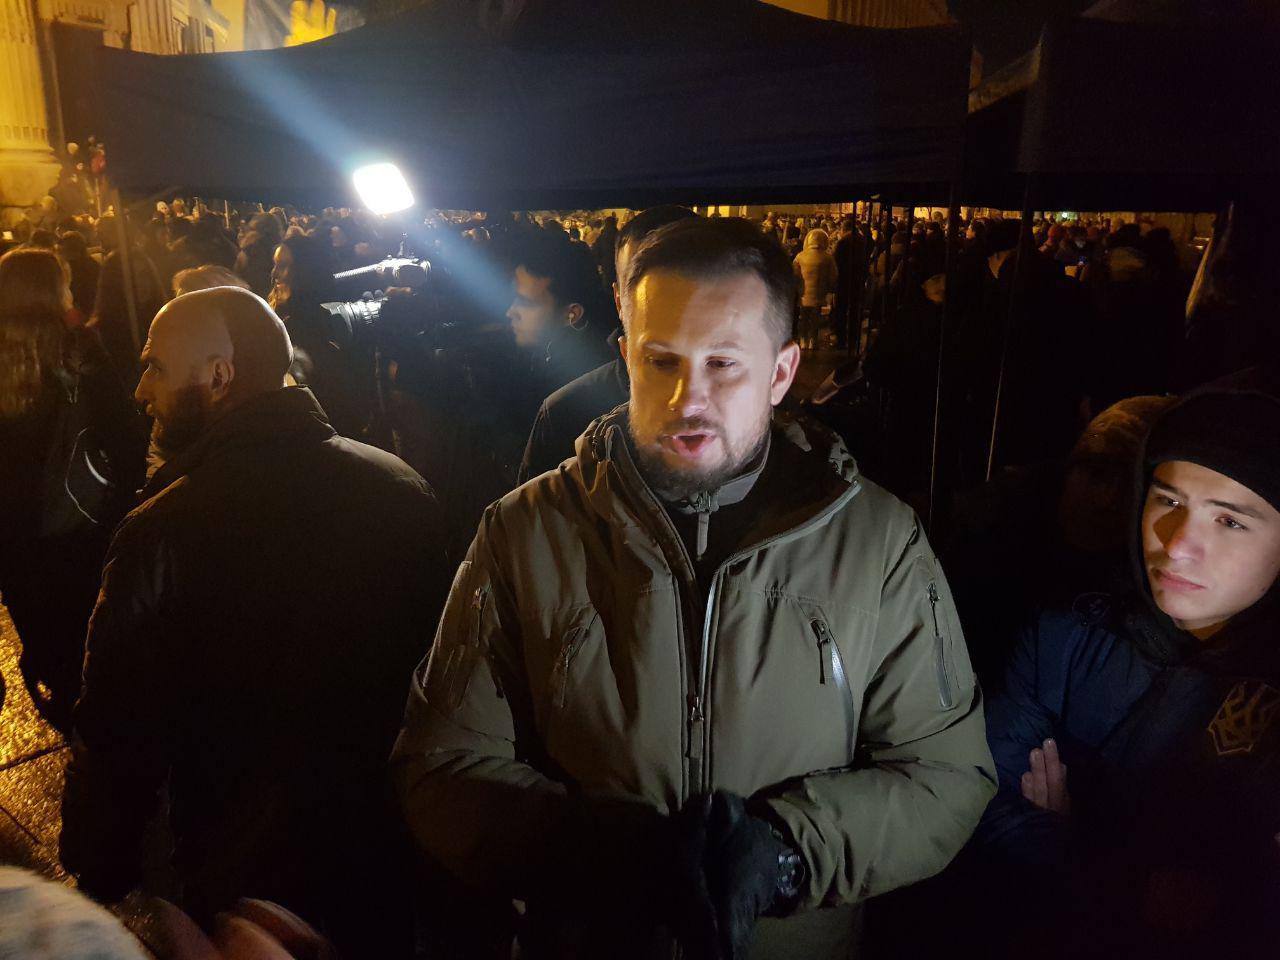 Билецкий: Я, как не идиот, на месте президента не поехал бы на встречу н...